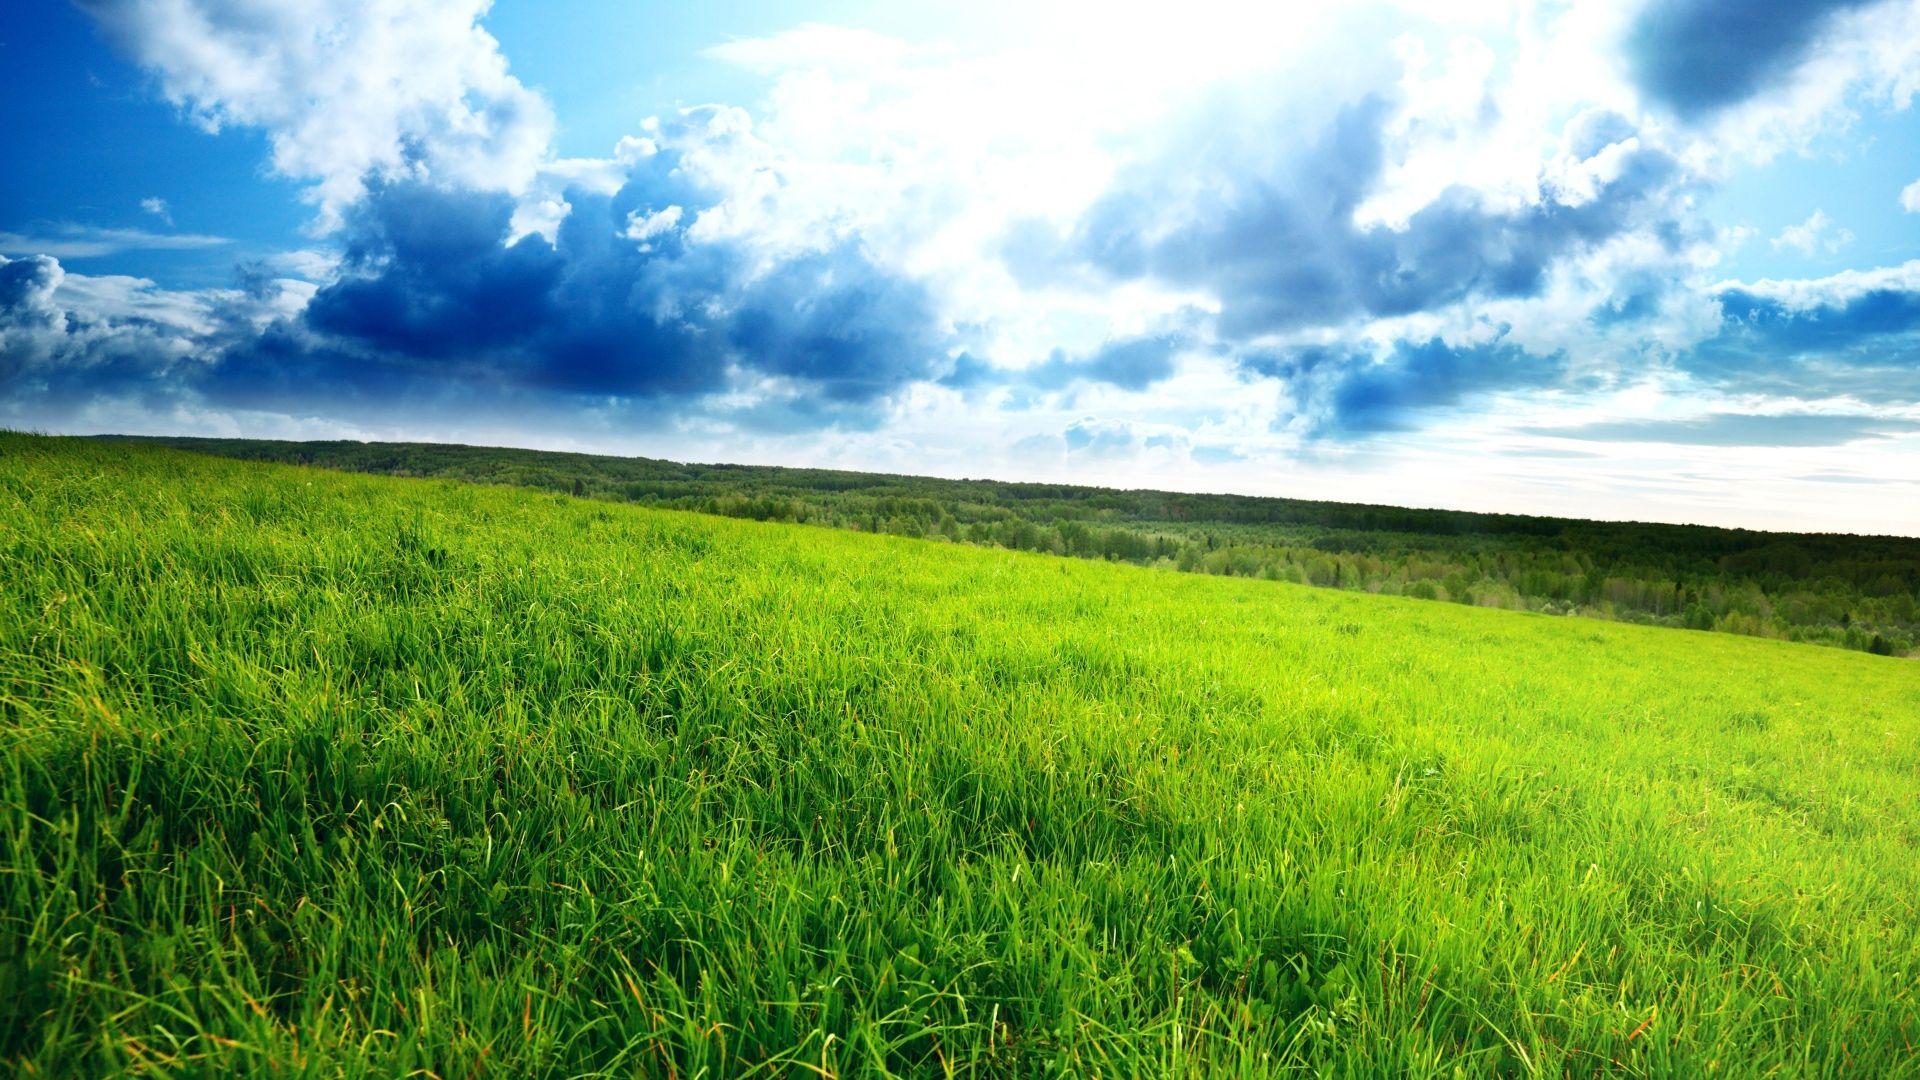 Natural Landscape Photography Wallpaper